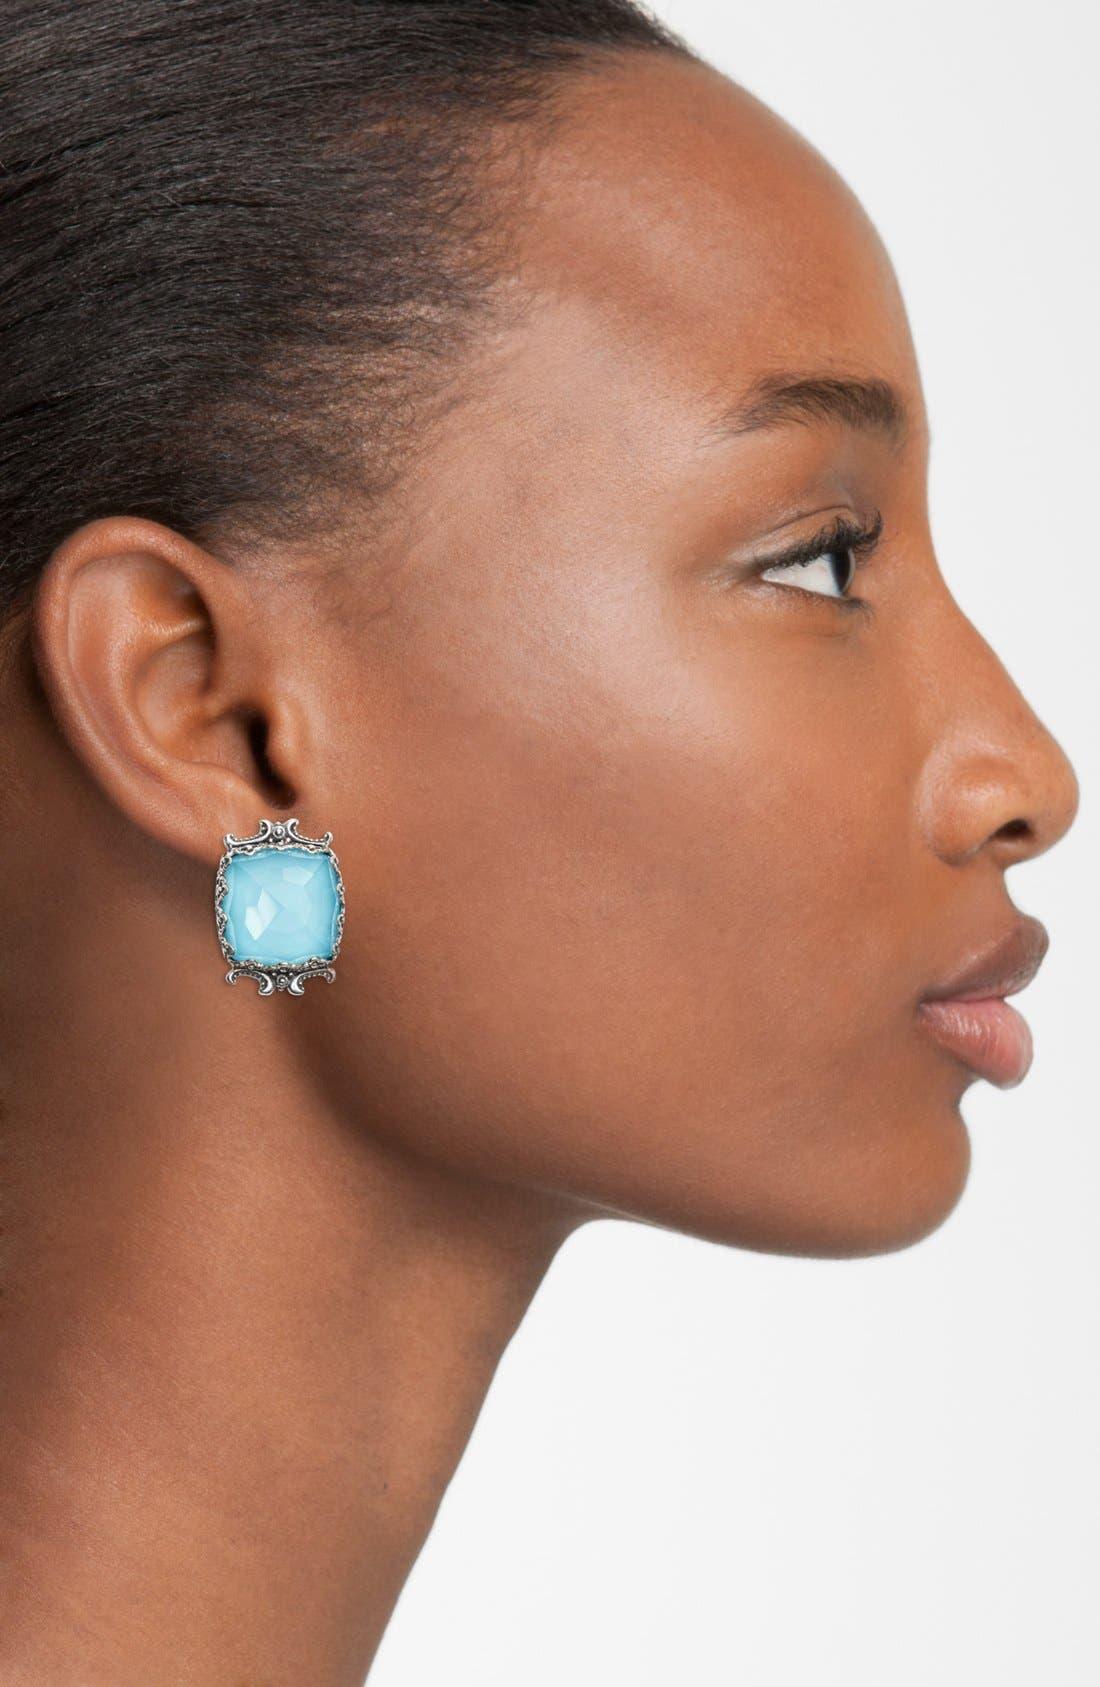 'Aegean' Clip Earrings,                             Alternate thumbnail 2, color,                             Silver/ Blue Rock Crystal